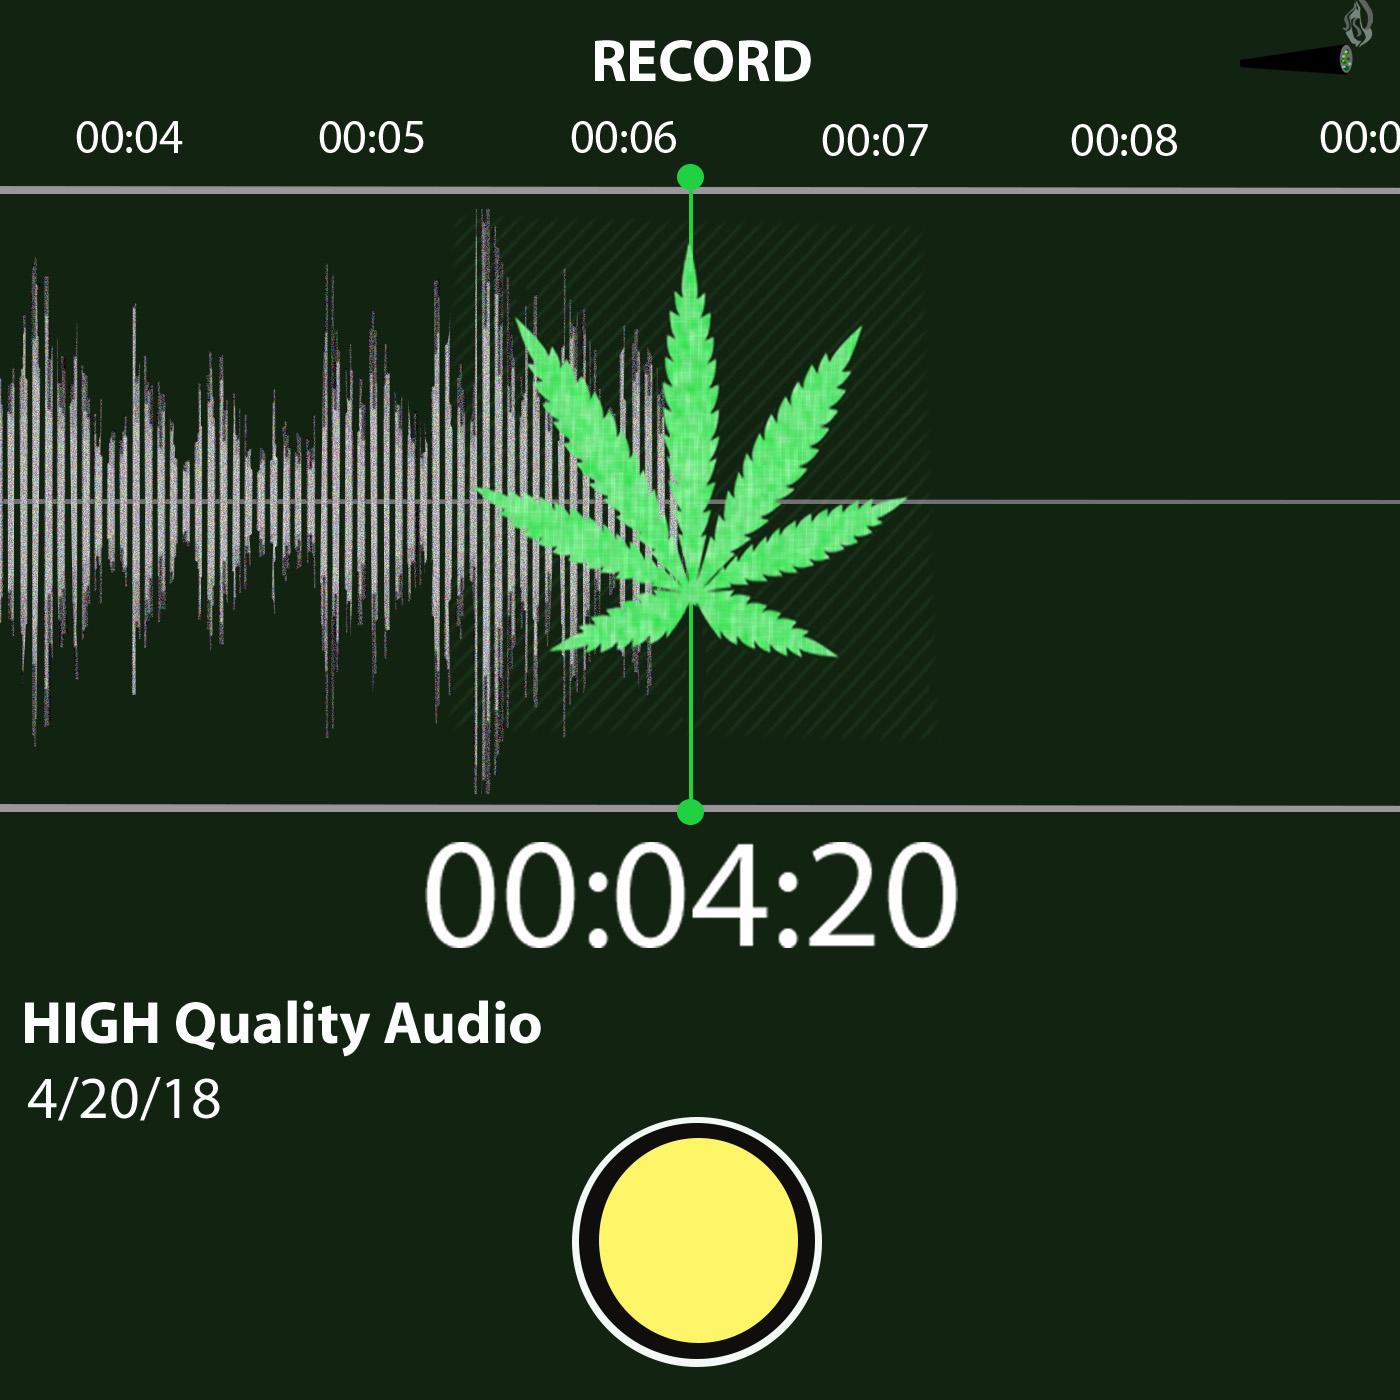 HIGH Quality Audio Icon #1.jpg